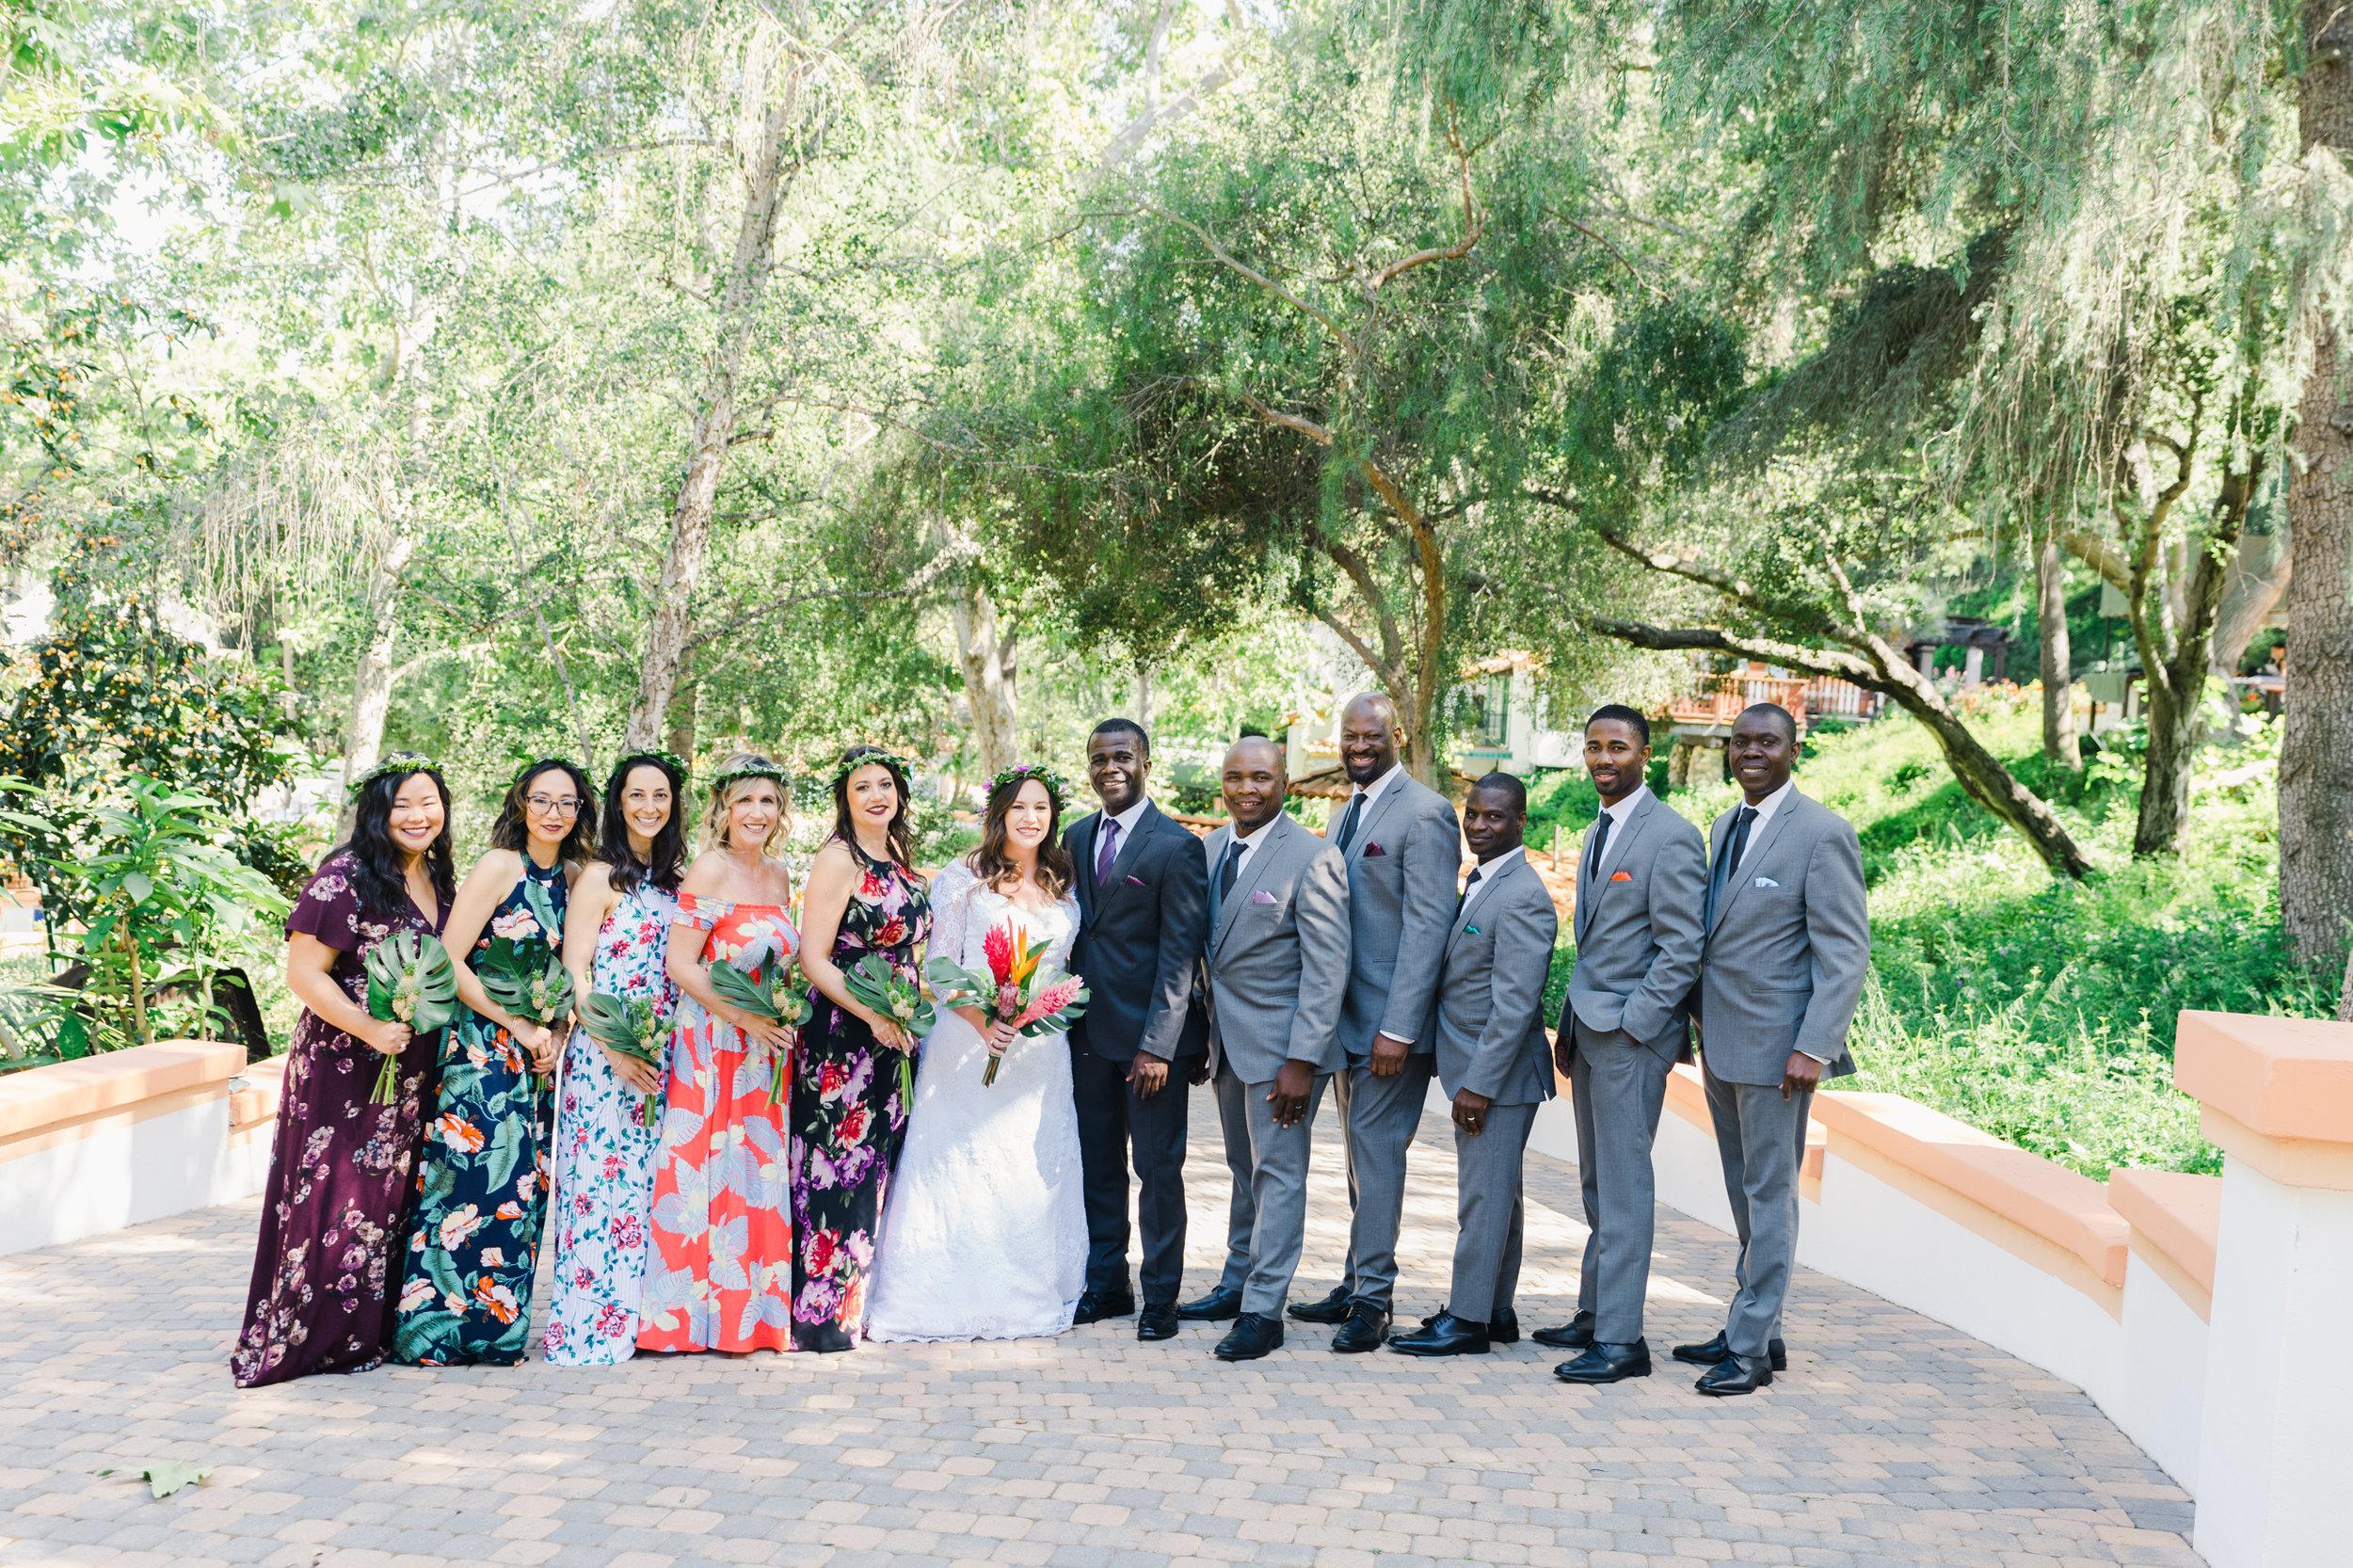 rancho-las-lomas-wedding-kelsey-sim_0079.JPG